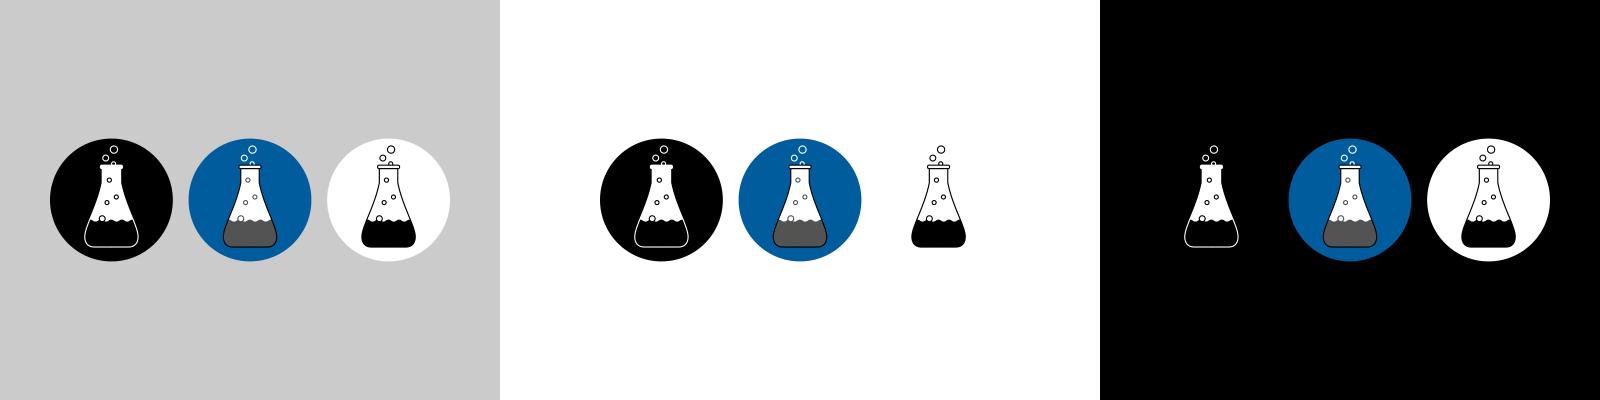 digital alchemist brand logo design colour variations